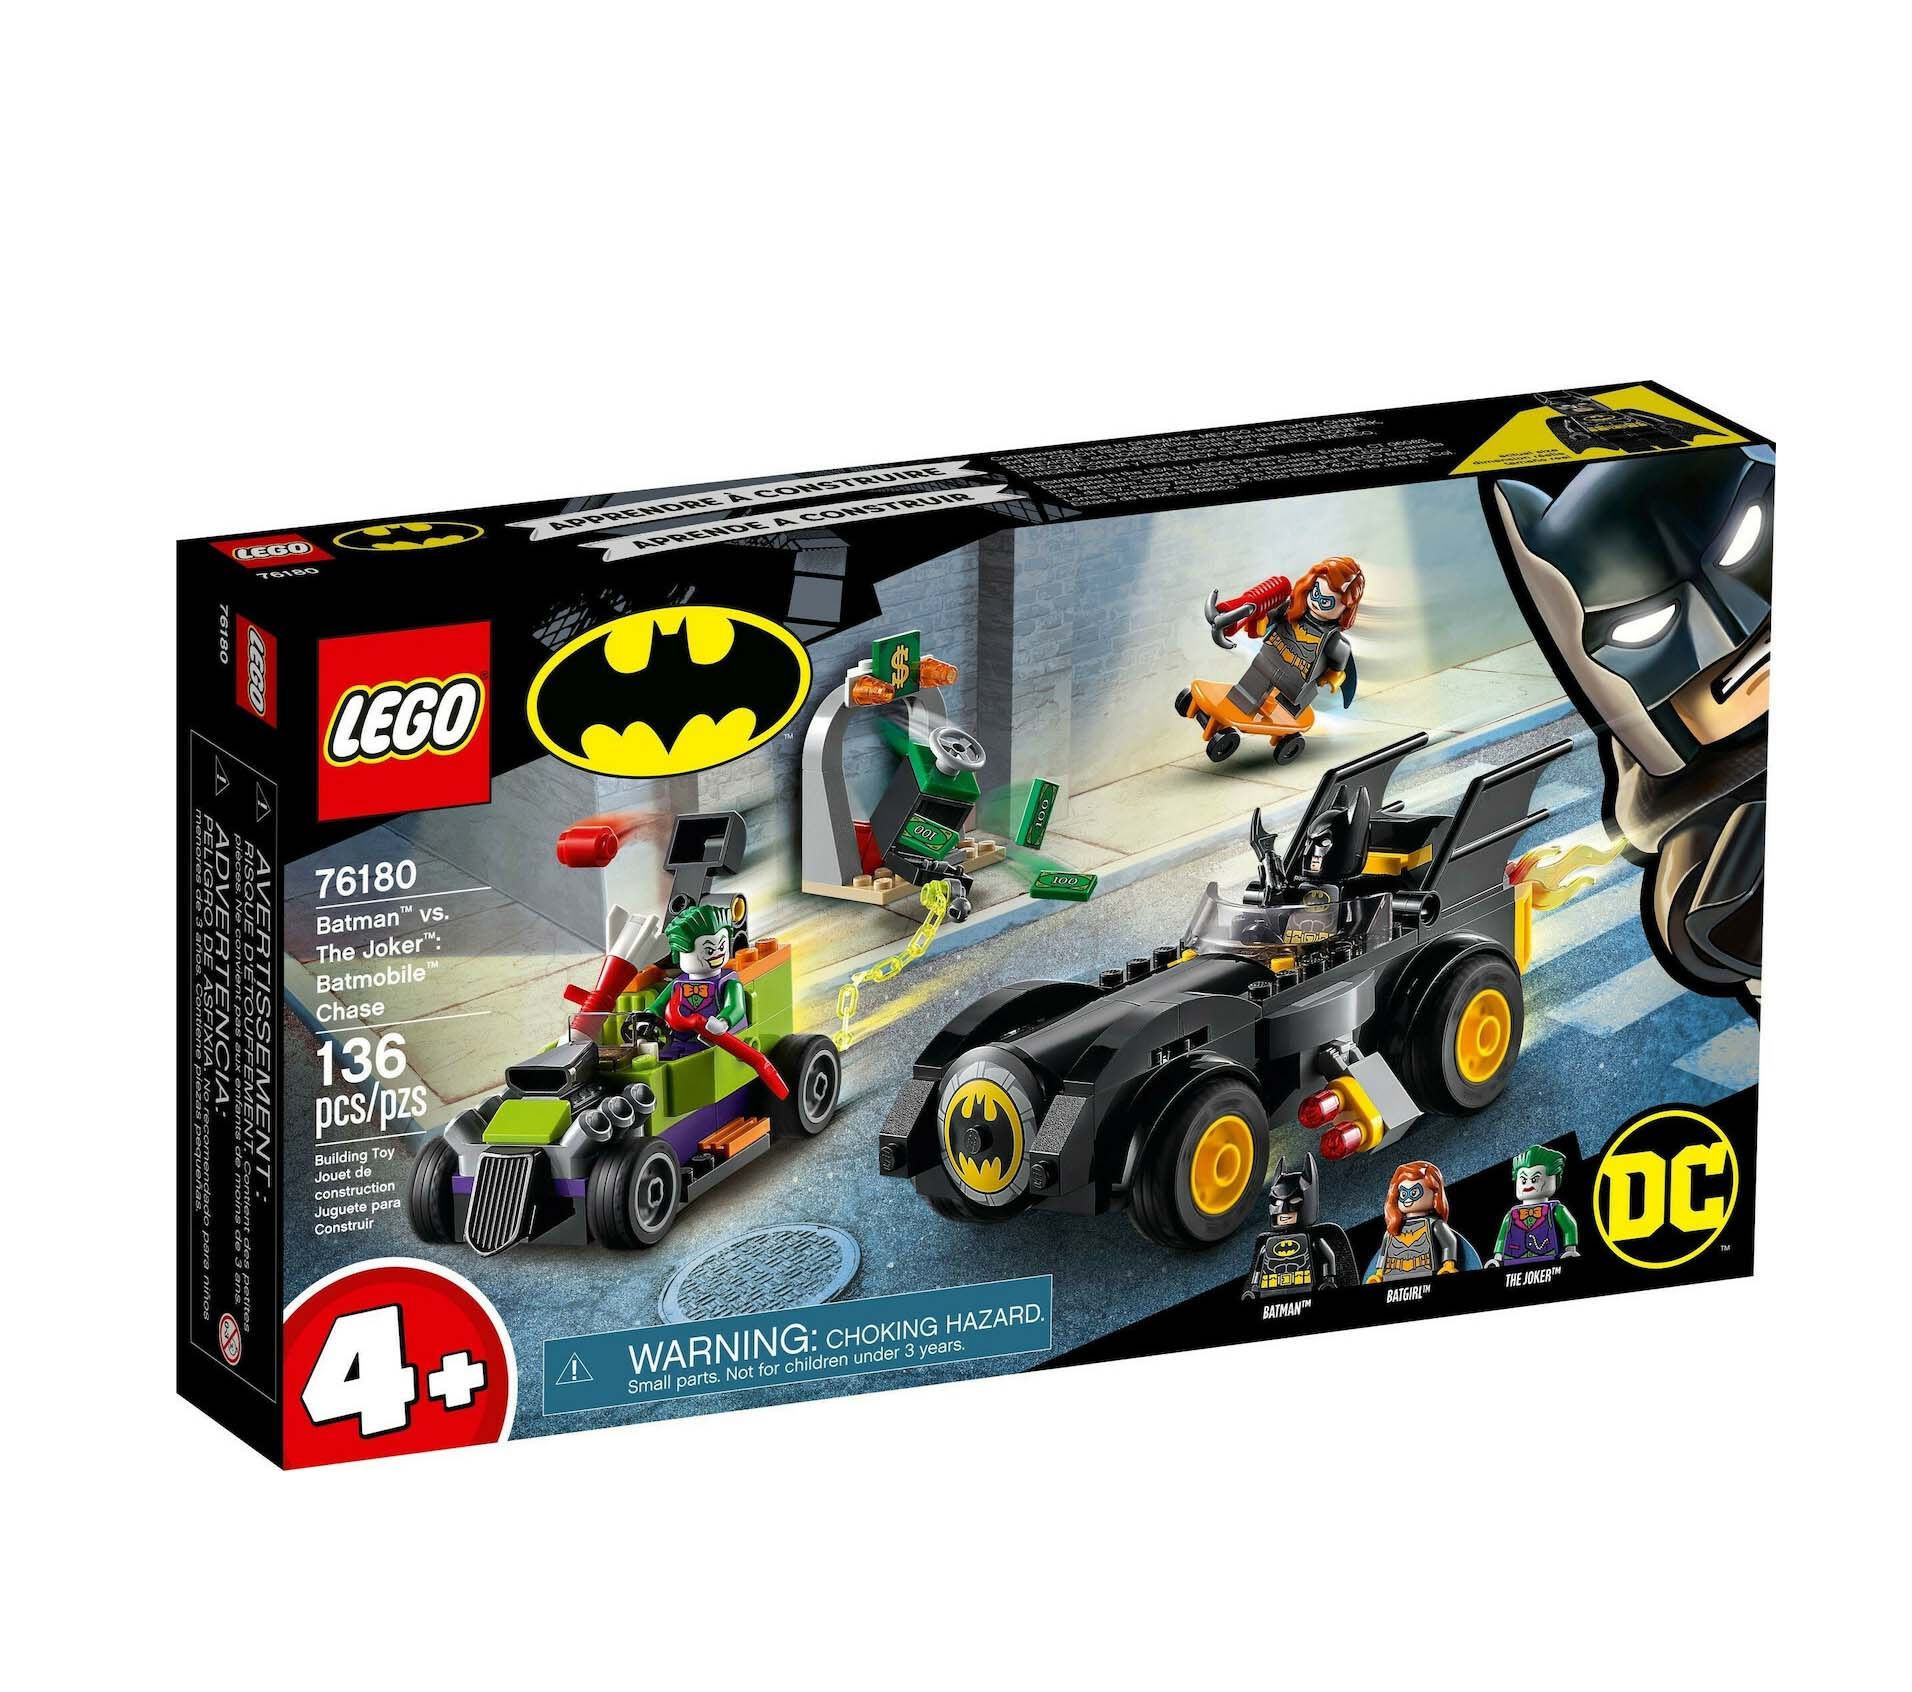 Lego Super Heroes: Batman vs Joker Batmobile Chase 76180